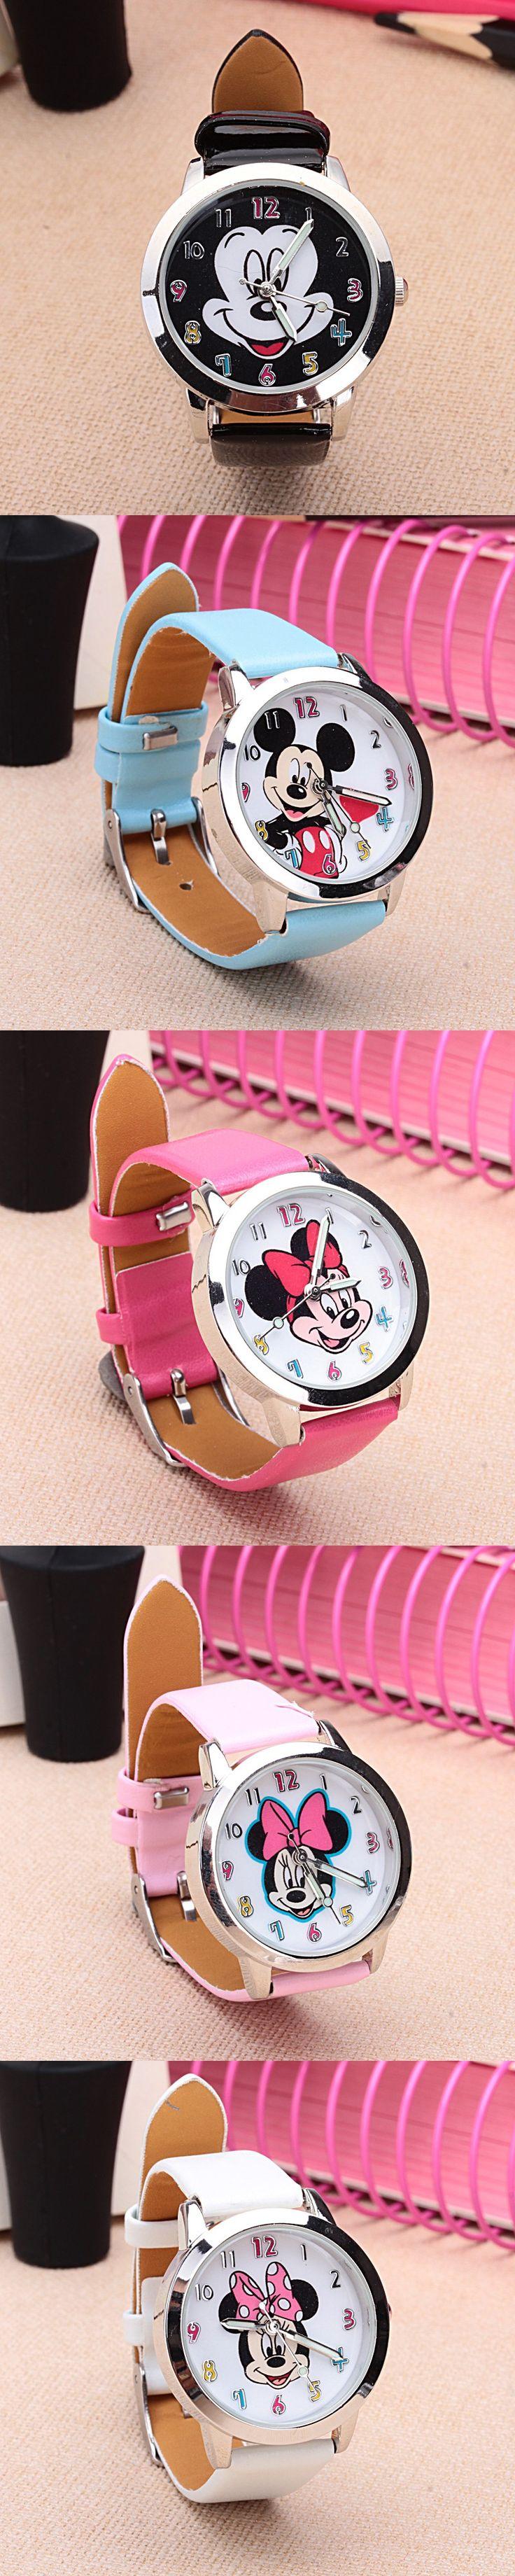 Mickey&Minnie Mouse Hello Kiity cartoon watch women watches kids quartz wristwatch child boy clock girl relogio infantil $4.6